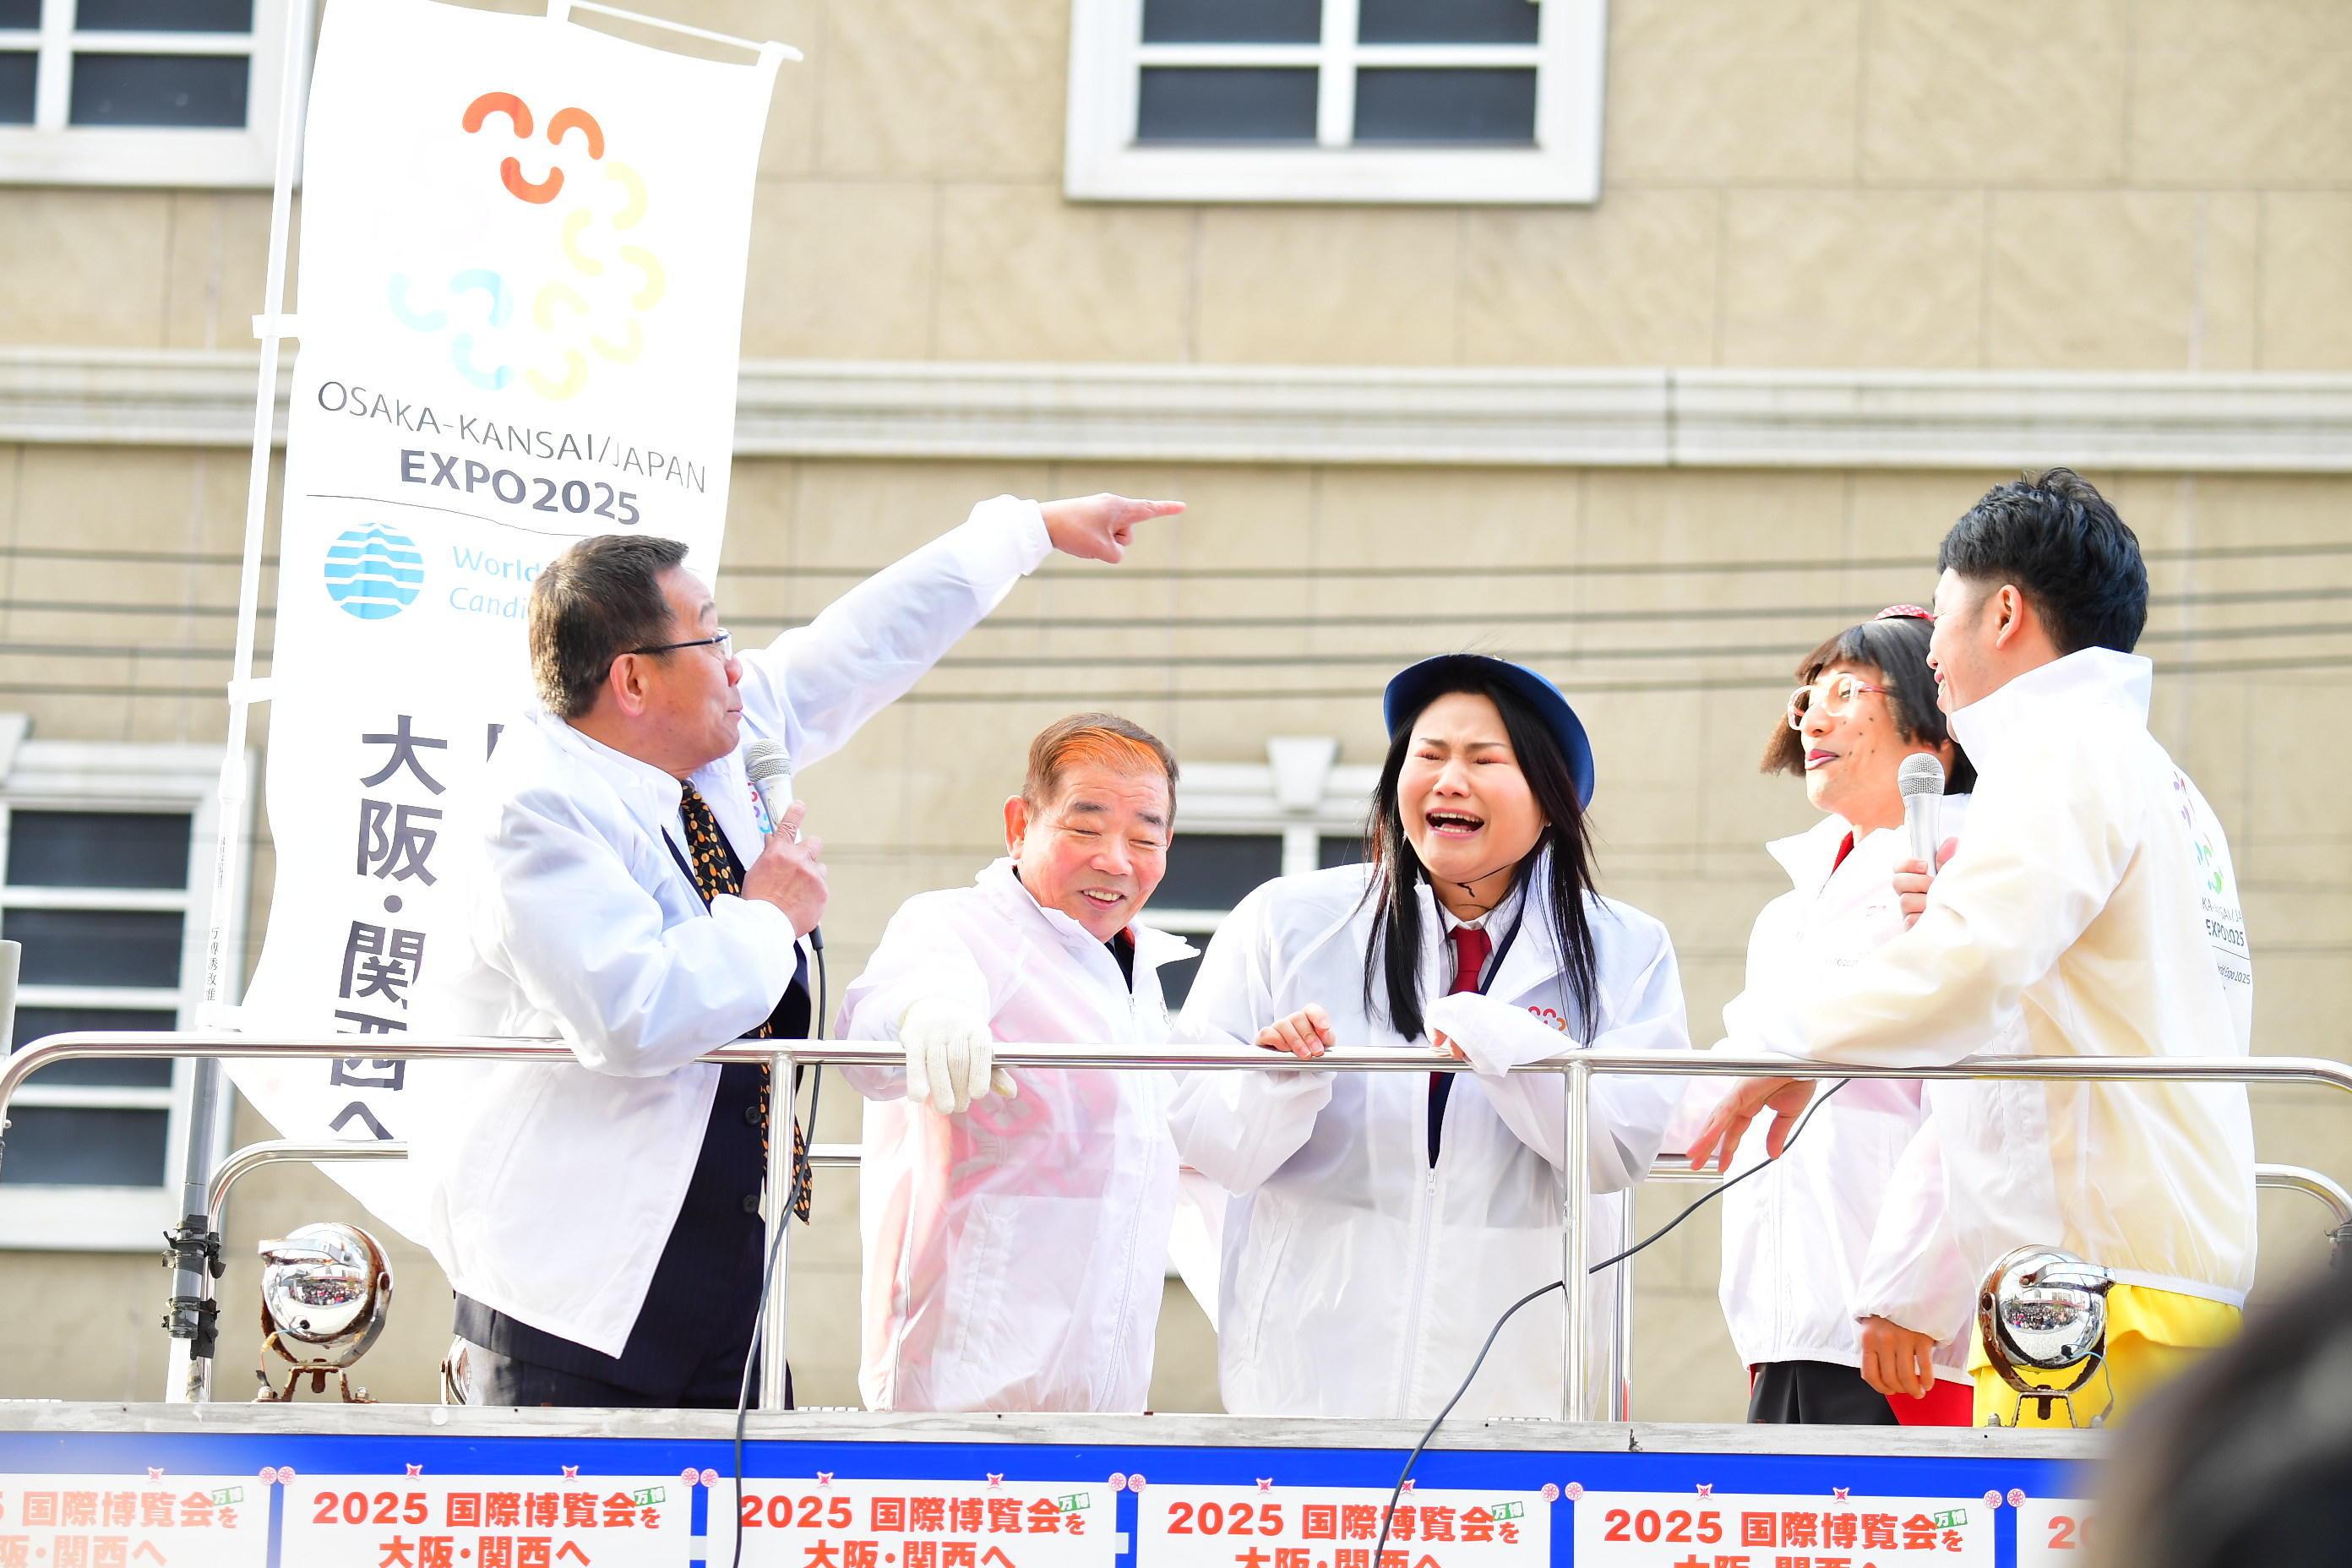 http://news.yoshimoto.co.jp/20180211185236-645a4705553138abee25bc72f8814ed2b906f33d.jpg